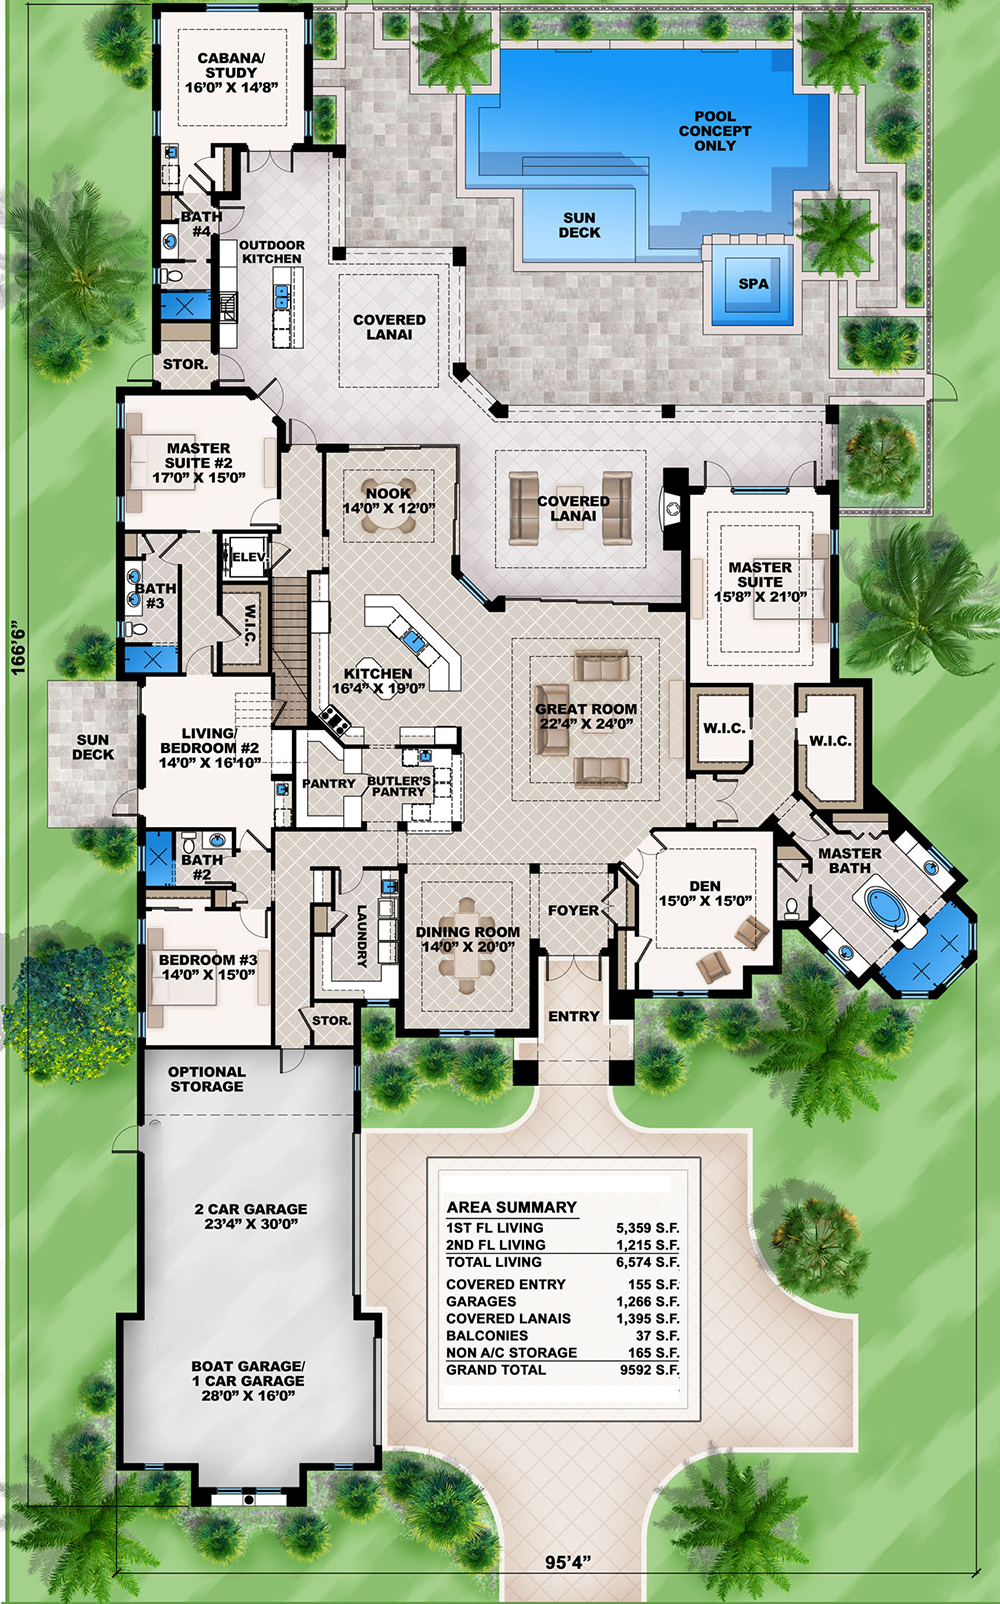 Mediterranean dream home plan with master suites bw florida spanish luxury st floor suite butler walk in pantry also rh pinterest